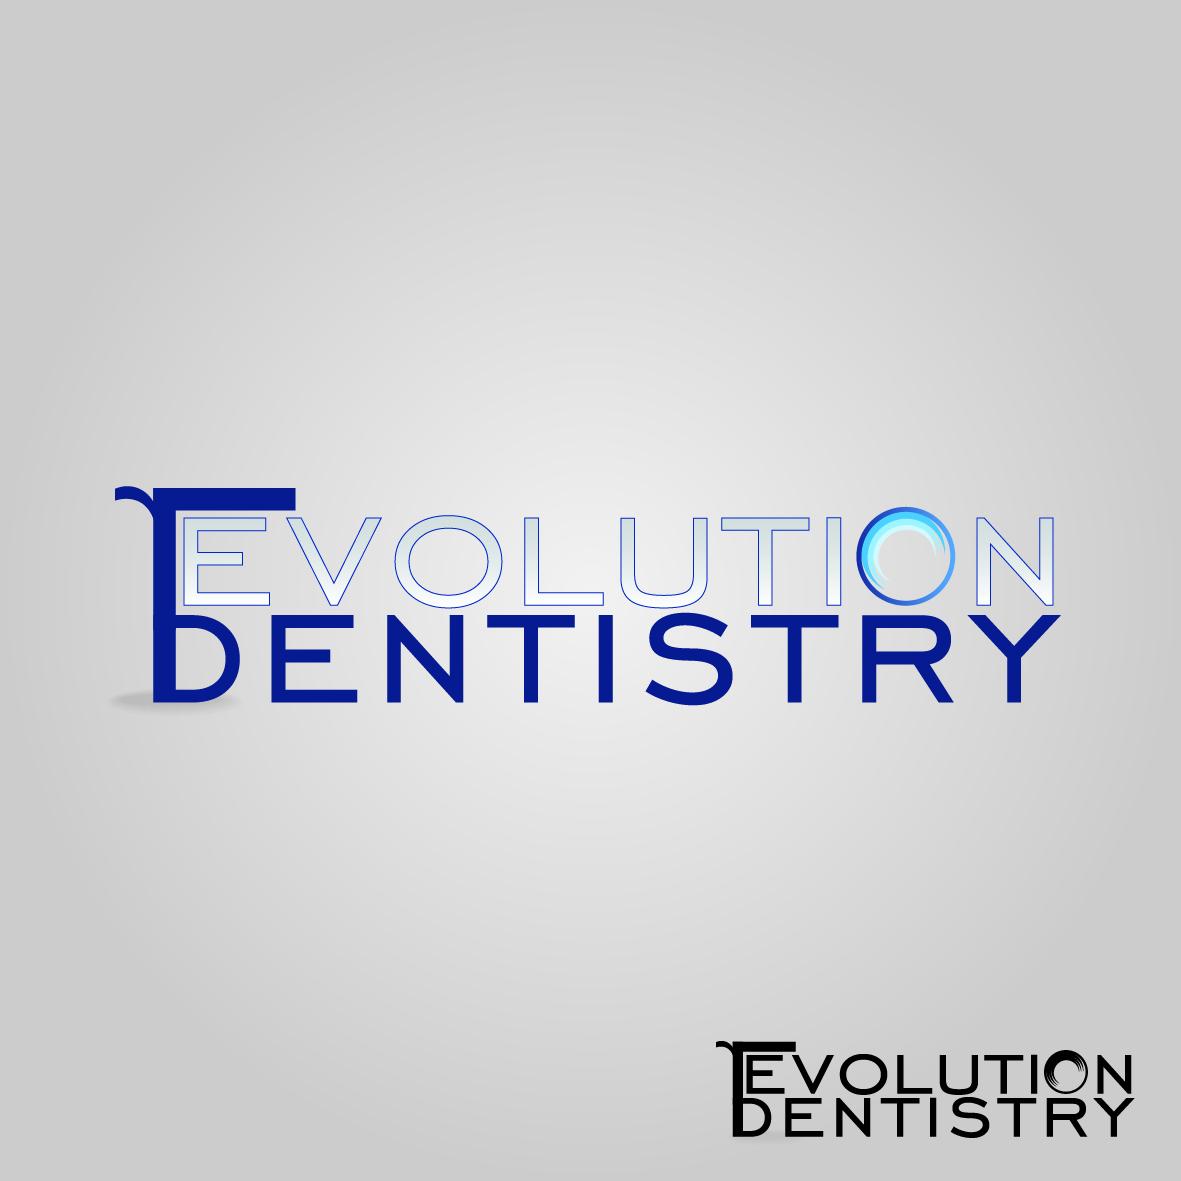 Logo Design by nTia - Entry No. 216 in the Logo Design Contest Artistic Logo Design for Revolution Dentistry.